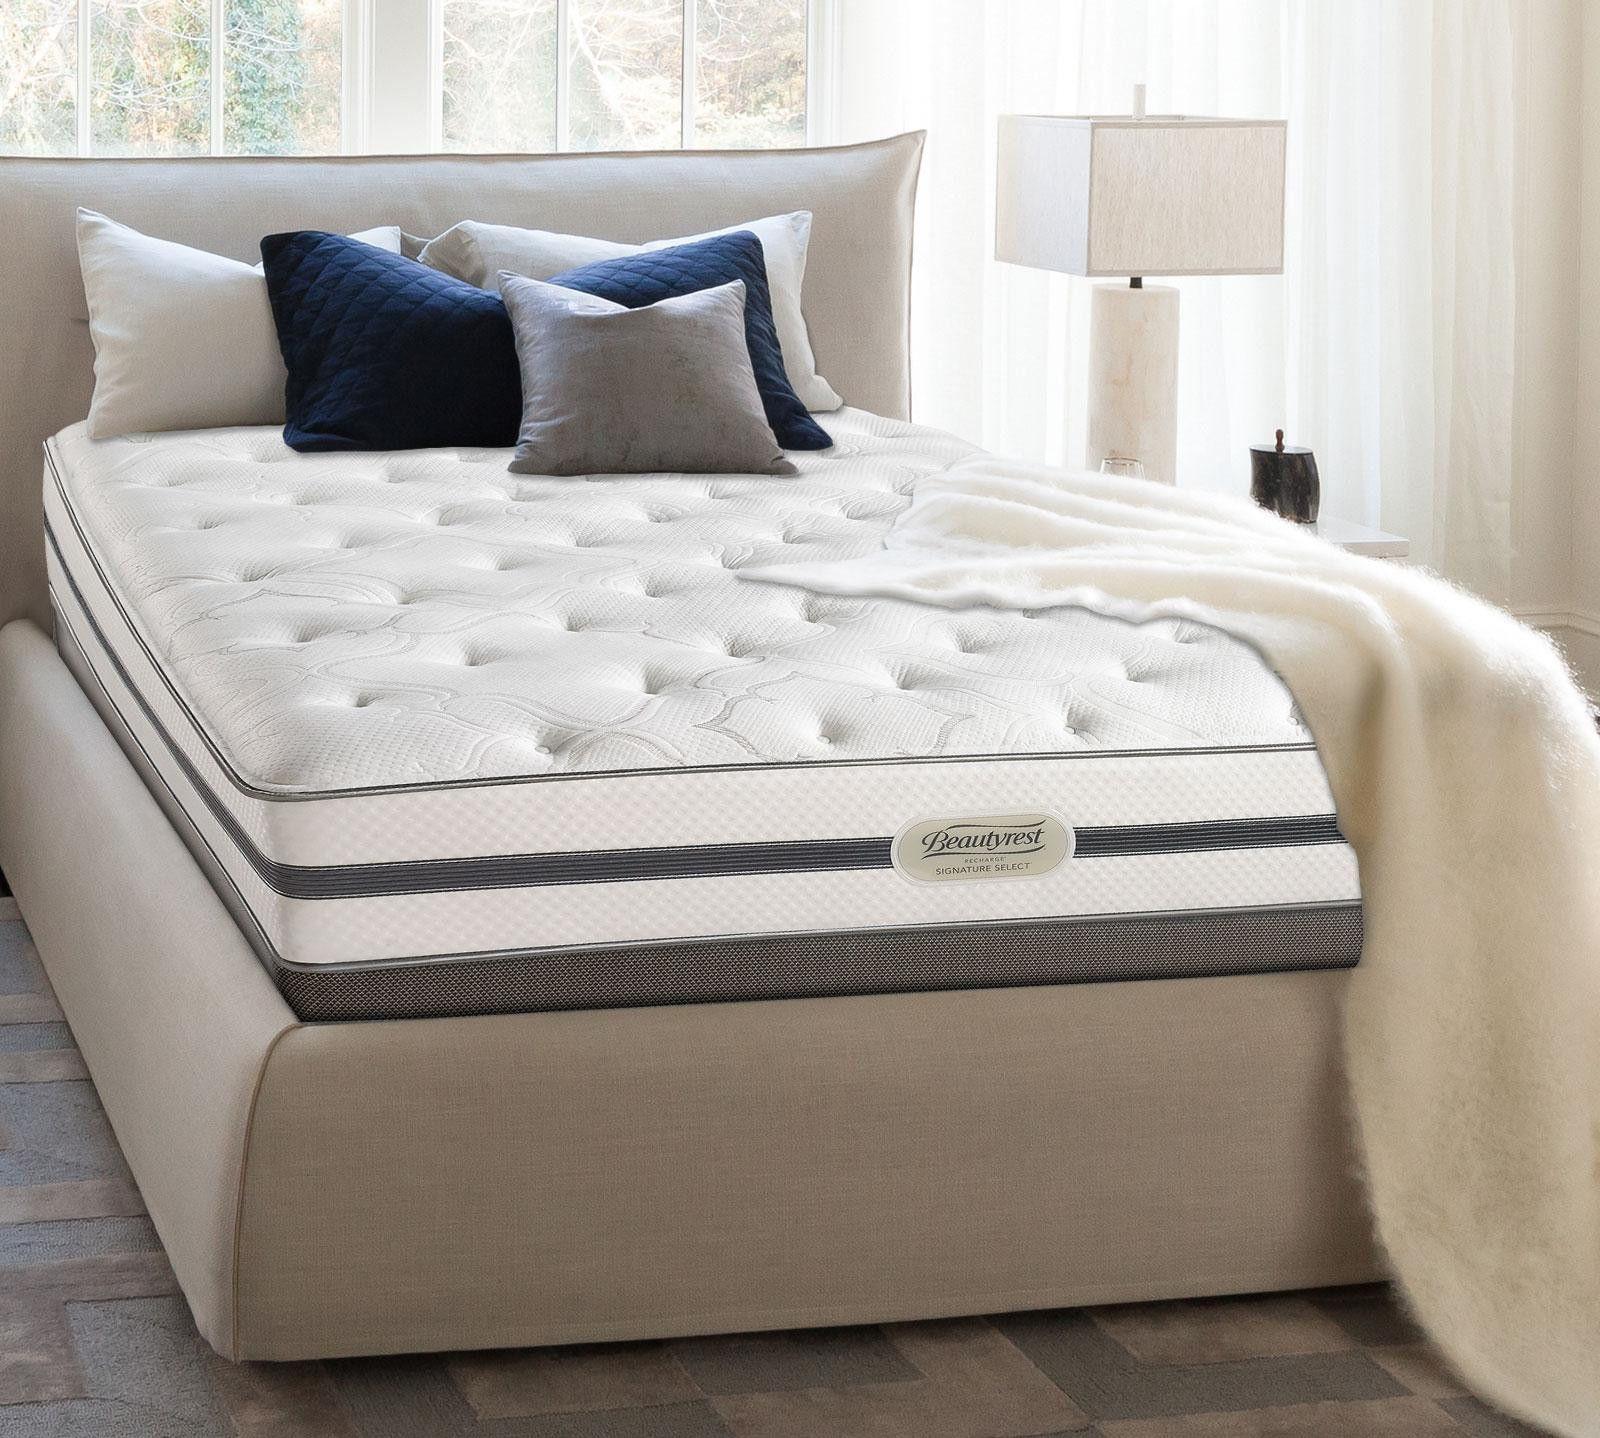 Simmons Beautyrest Pillow Top King Mattress Real Simple 20